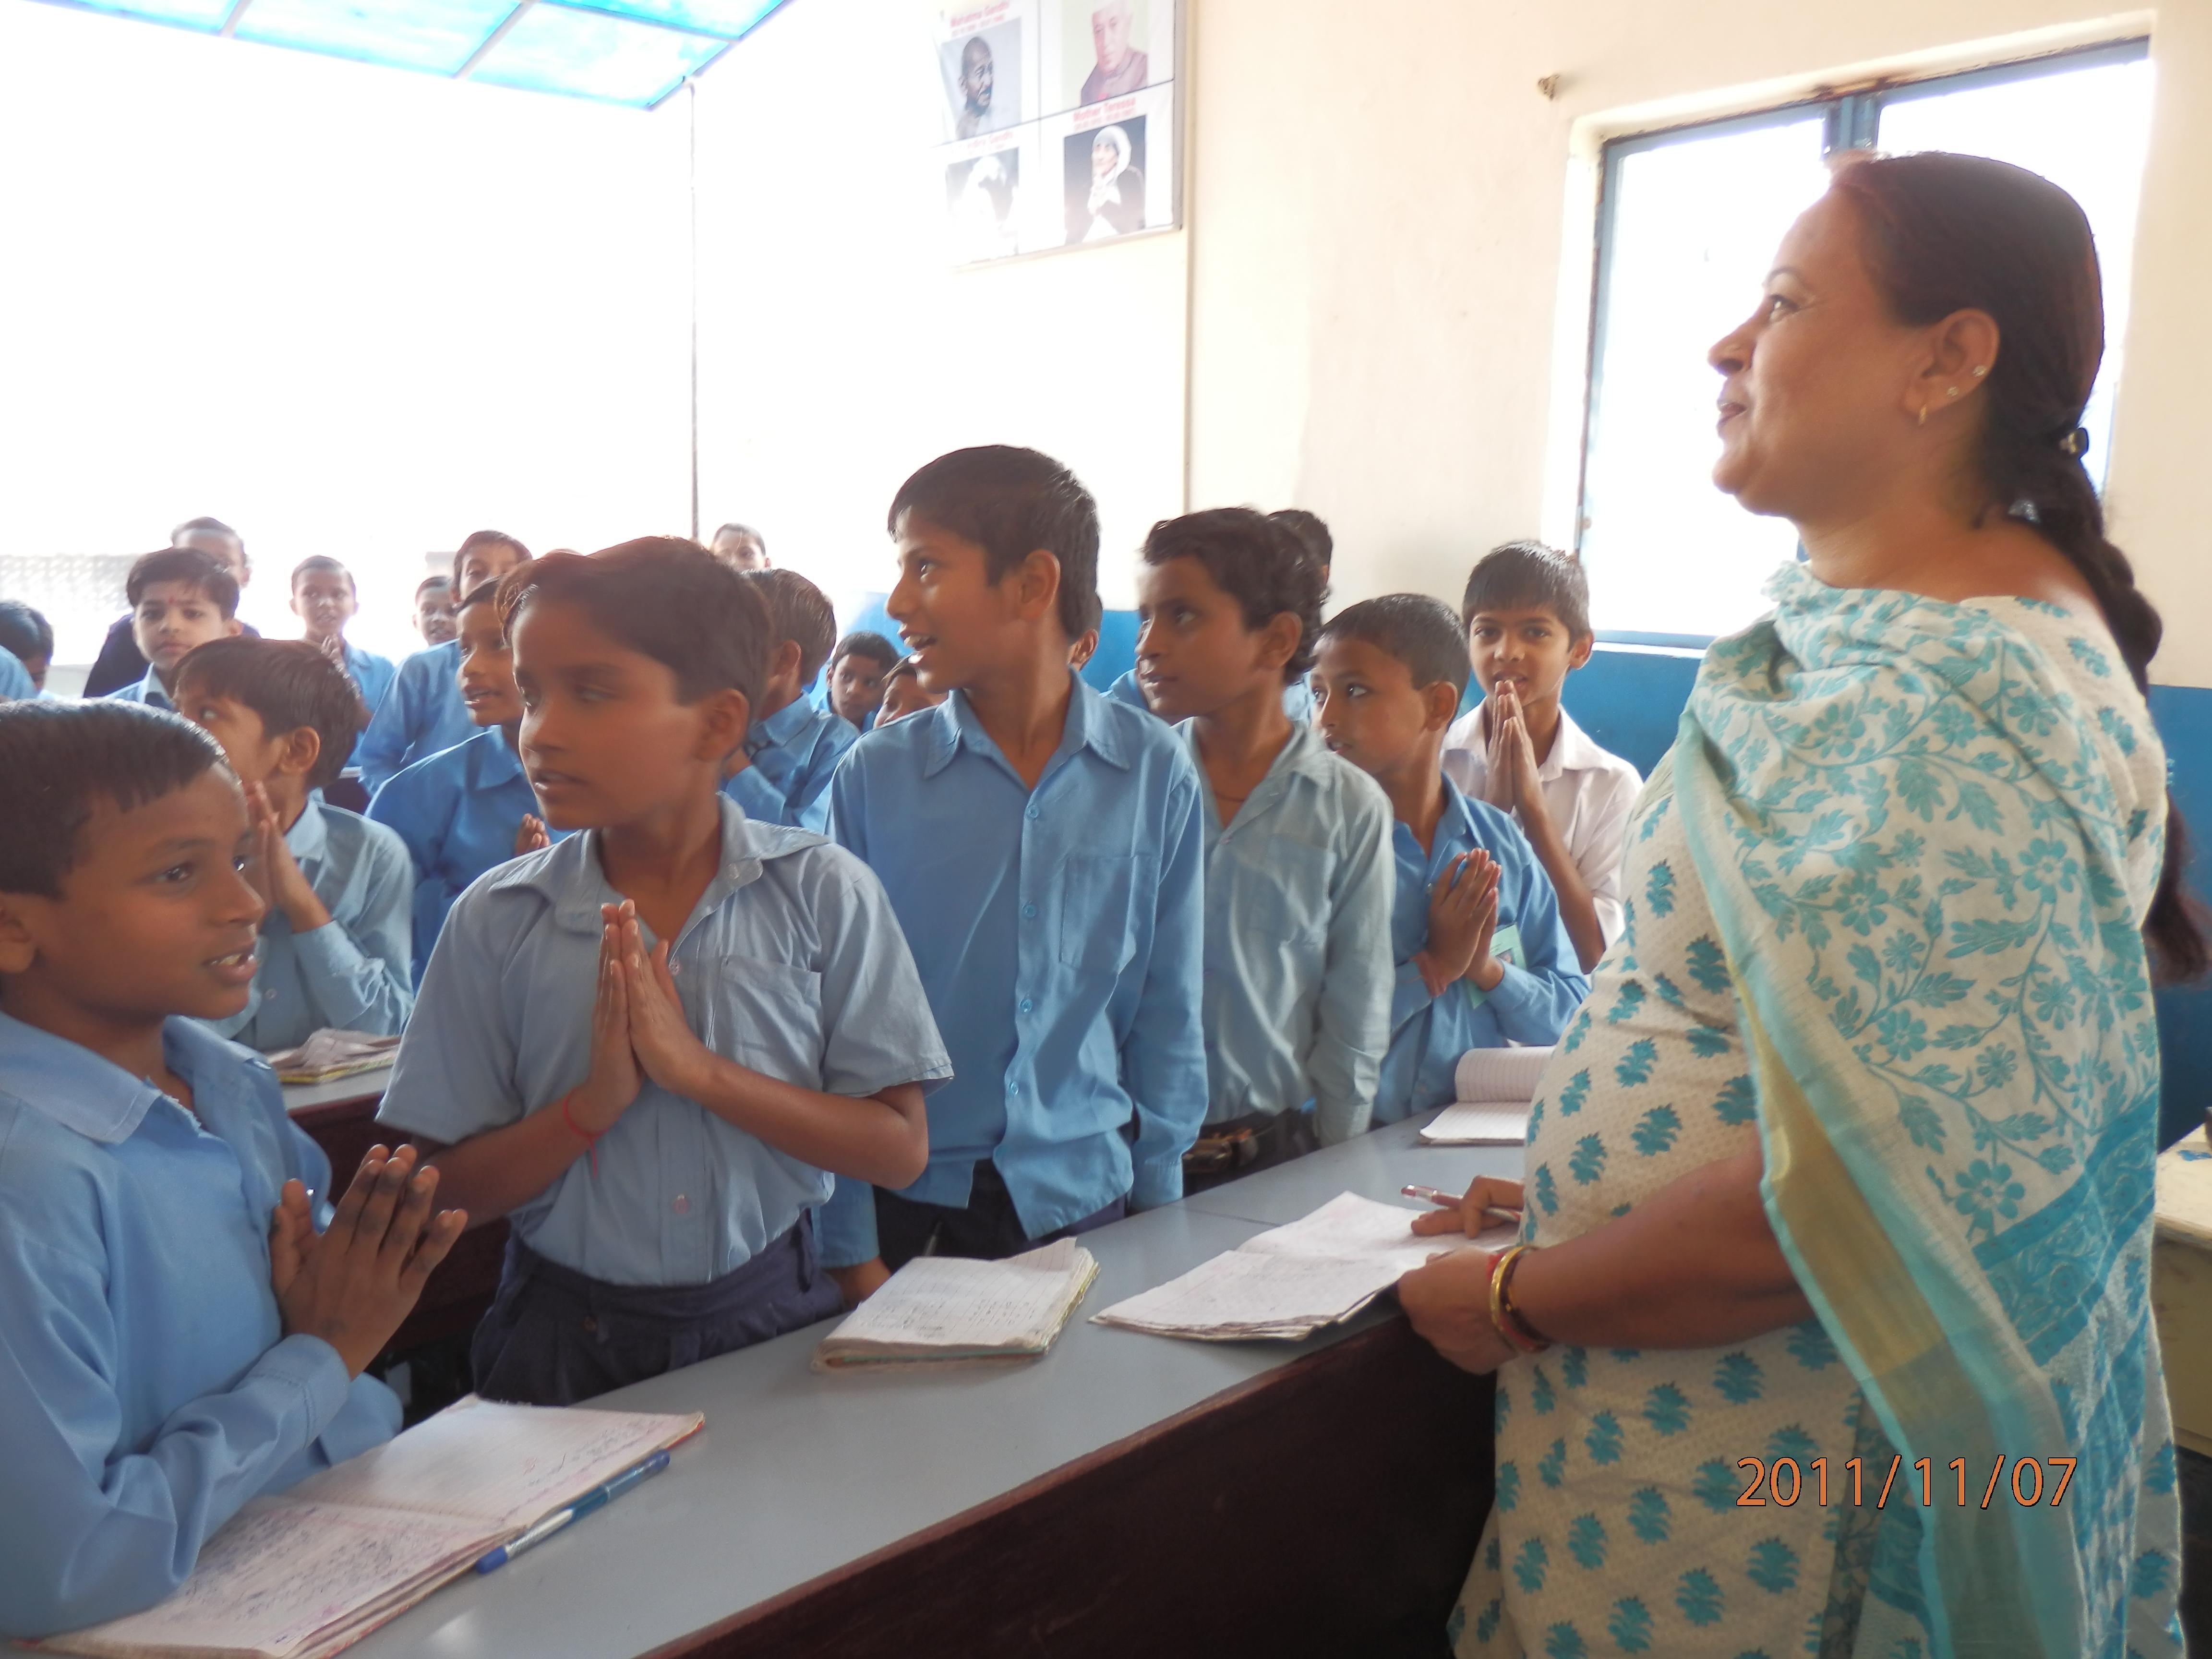 LKS project in Nand Nagri, Delhi